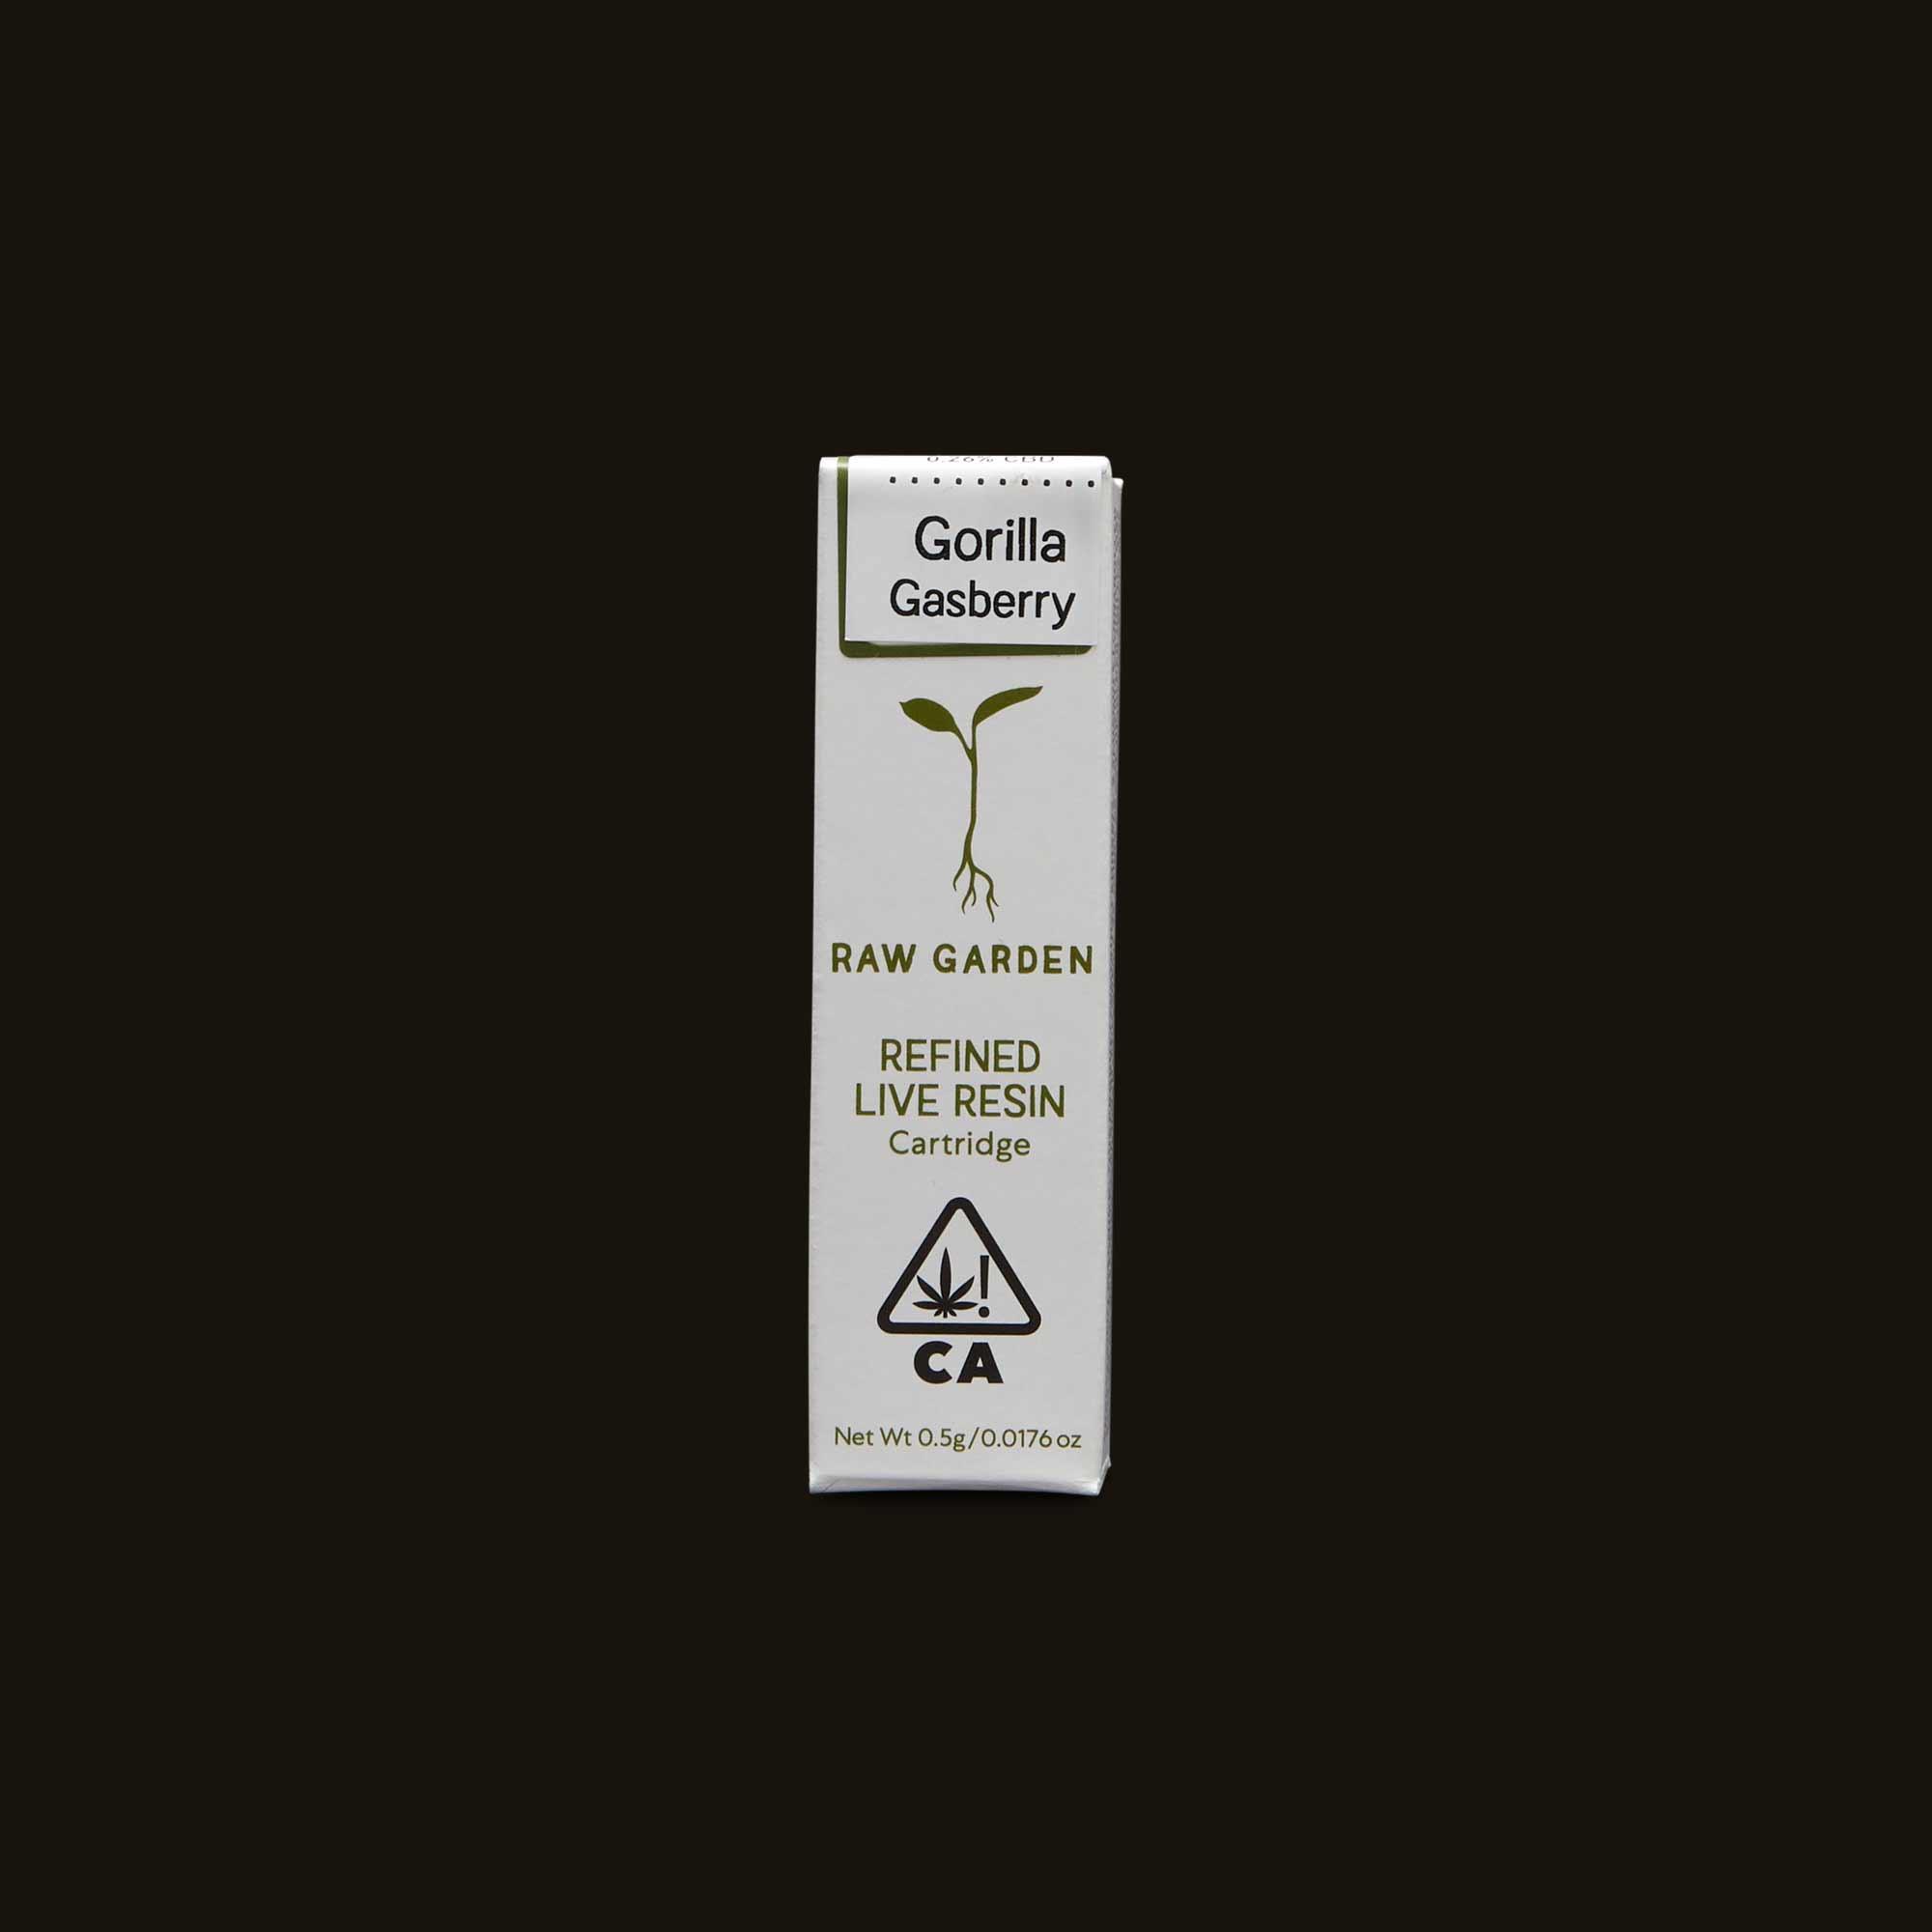 Gorilla Gasberry Cartridge - 500mg cartridge